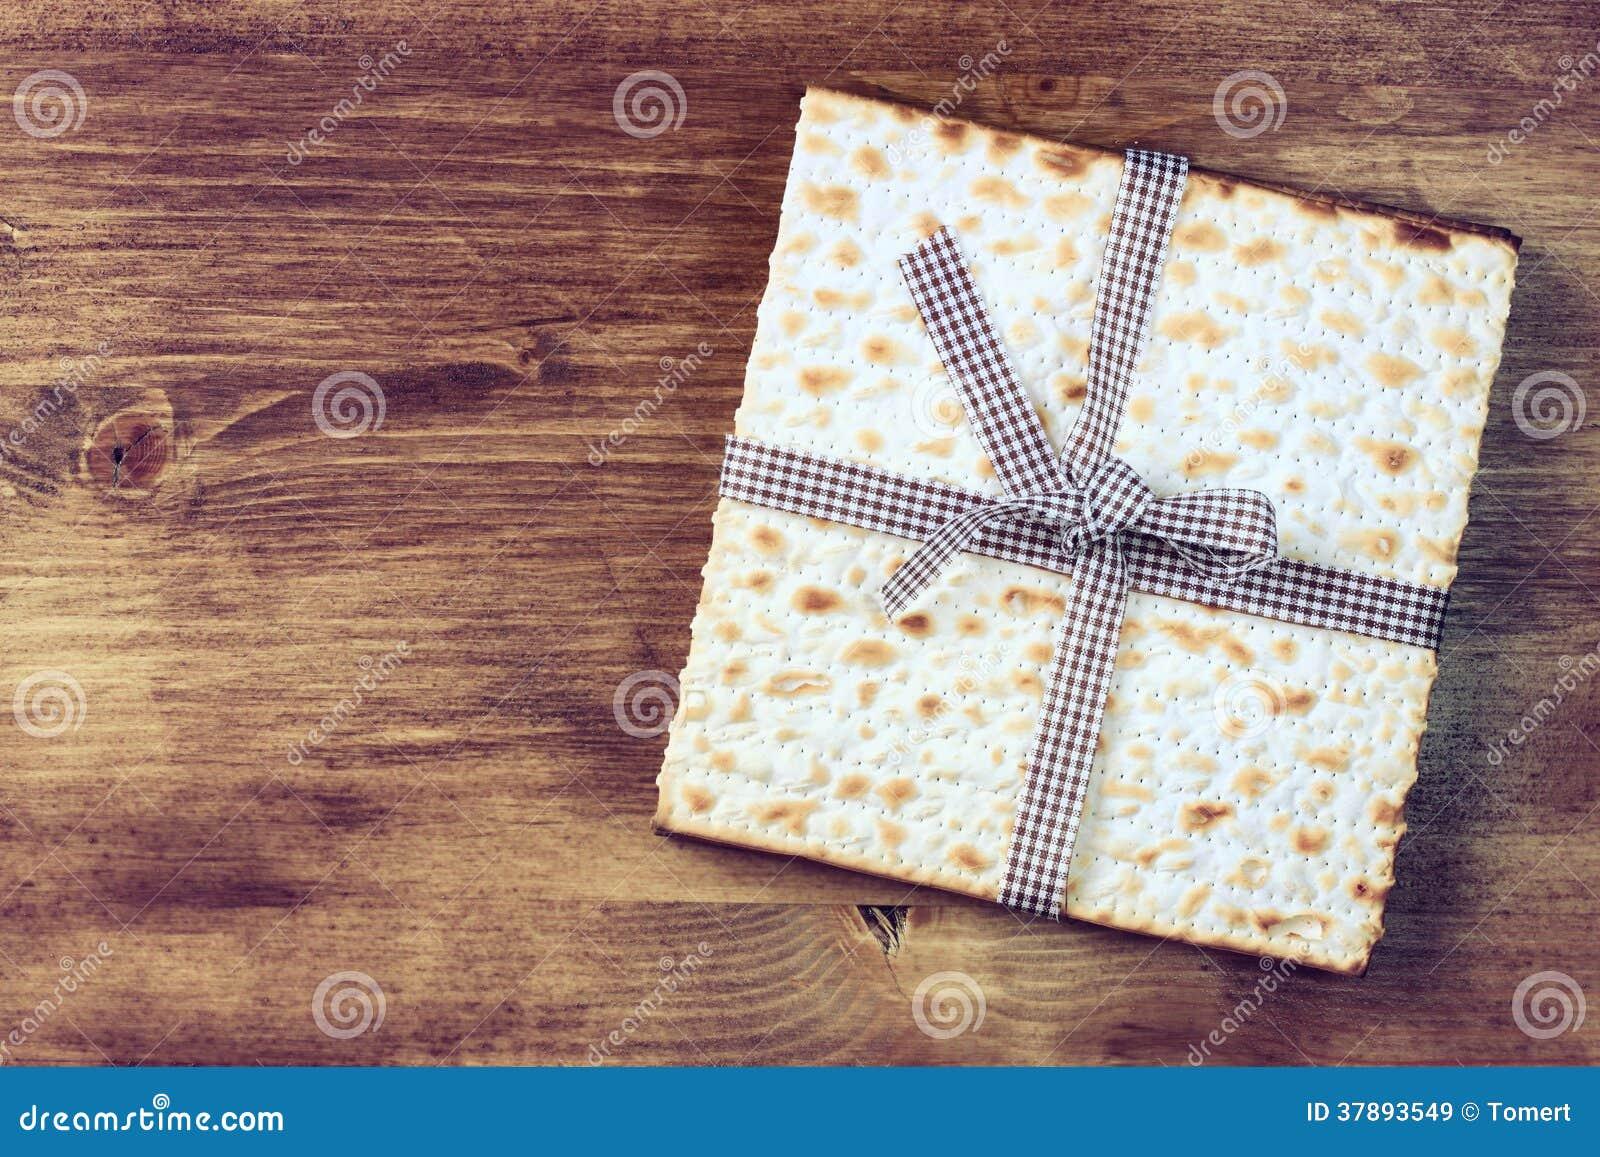 Paschaachtergrond. wijn en matzoh (Joods passoverbrood) over houten achtergrond.